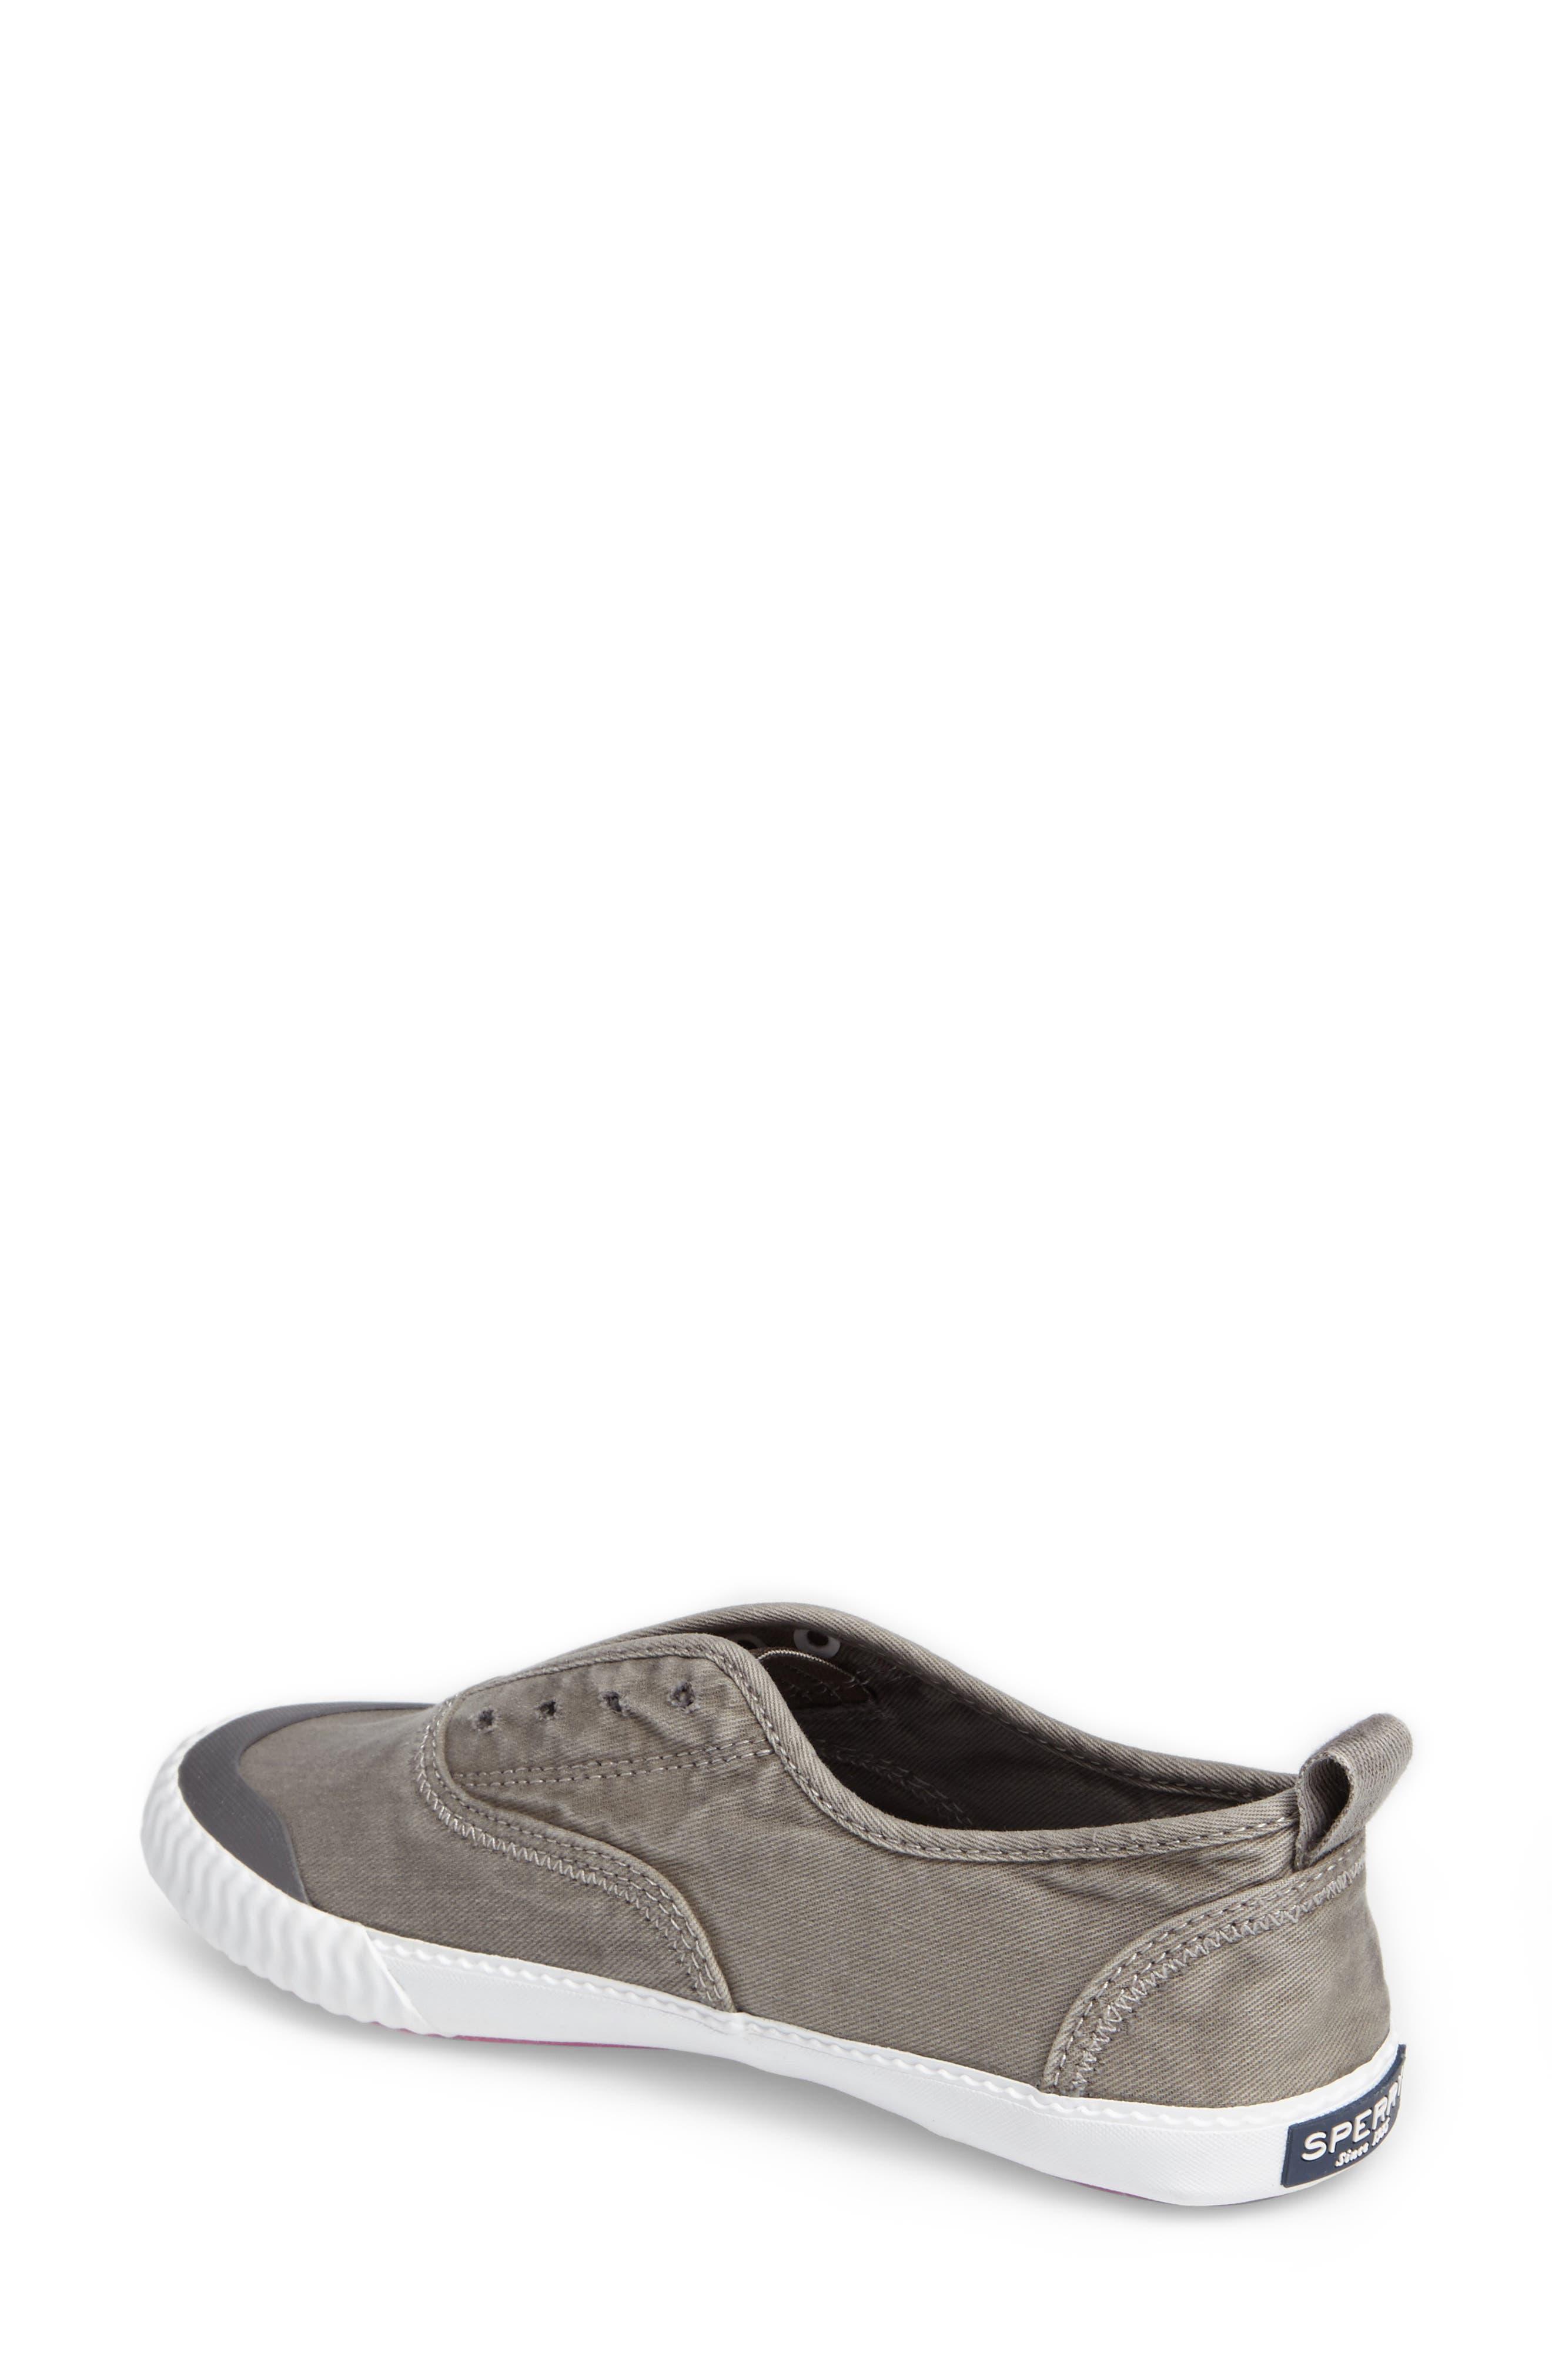 Sayel Slip-On Sneaker,                             Alternate thumbnail 2, color,                             GREY FABRIC